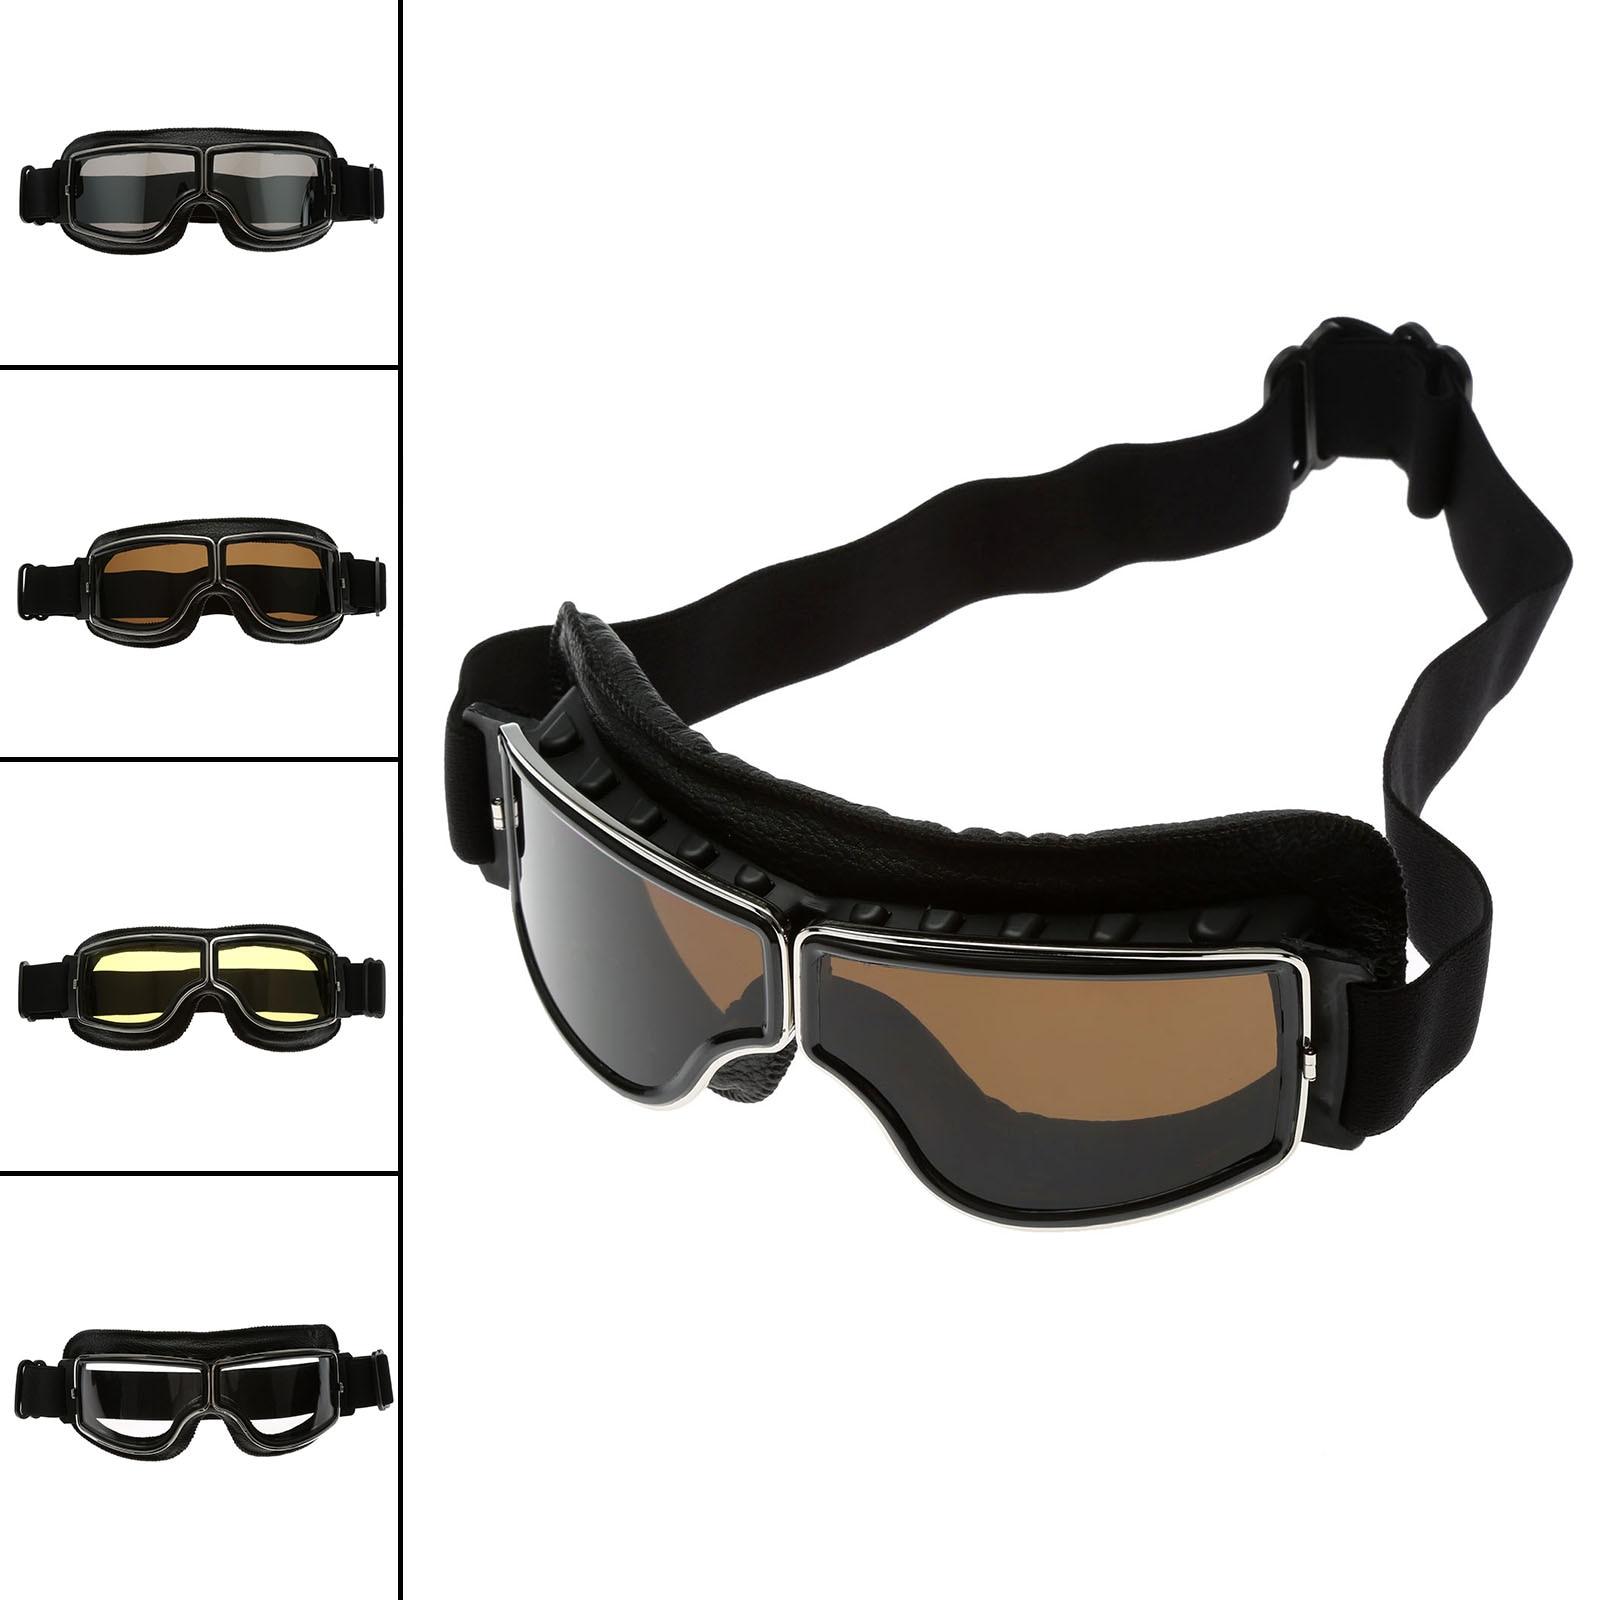 Retro Motorcycle Goggles For Harley Motocross Helmet Glasses UV Protection Ski Snowboard Skate Goggle Retro Eyewear Lens Leather